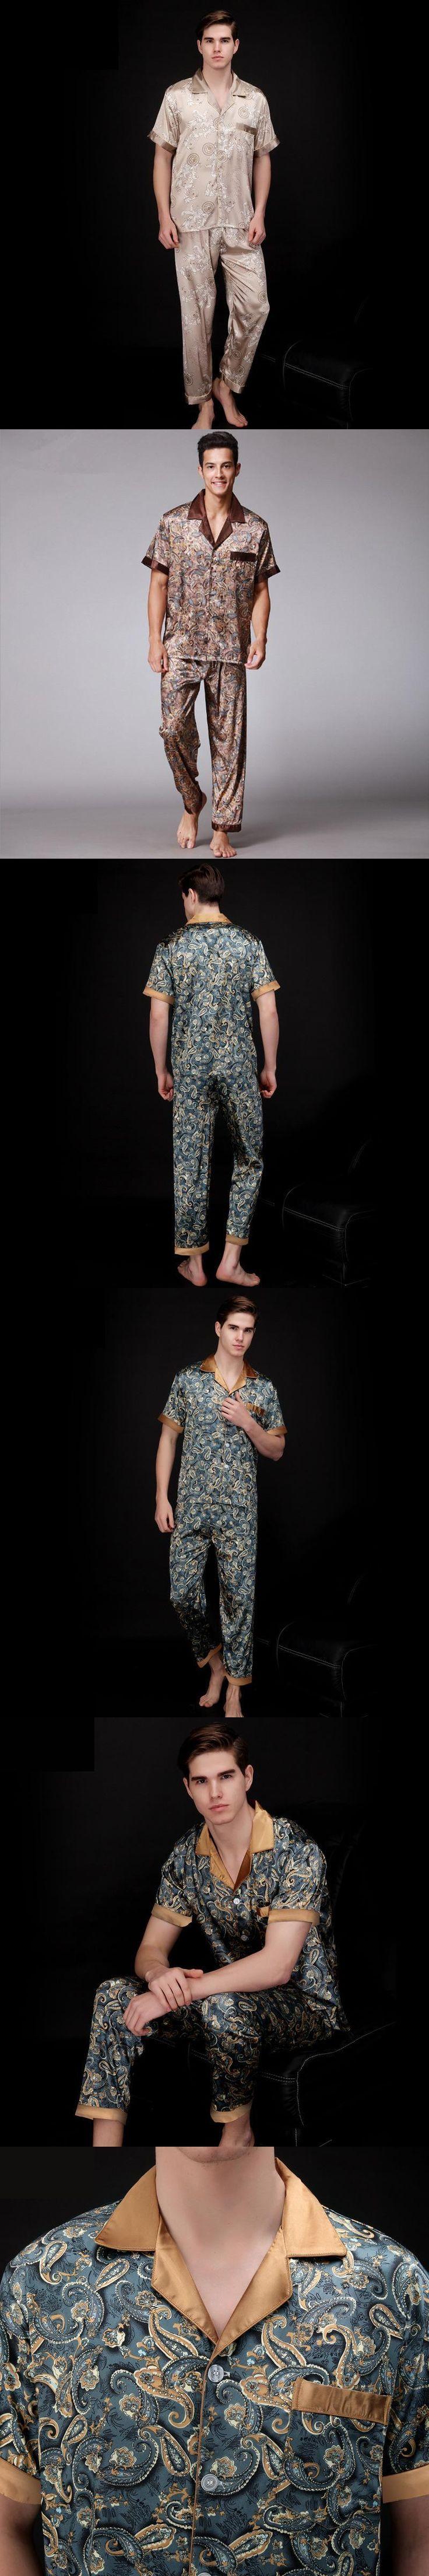 Paisley Silk Pajamas Men Summer Short Sleeve Satin Sleepwear Male Plus Size plus size Dressing Gown Nightgown